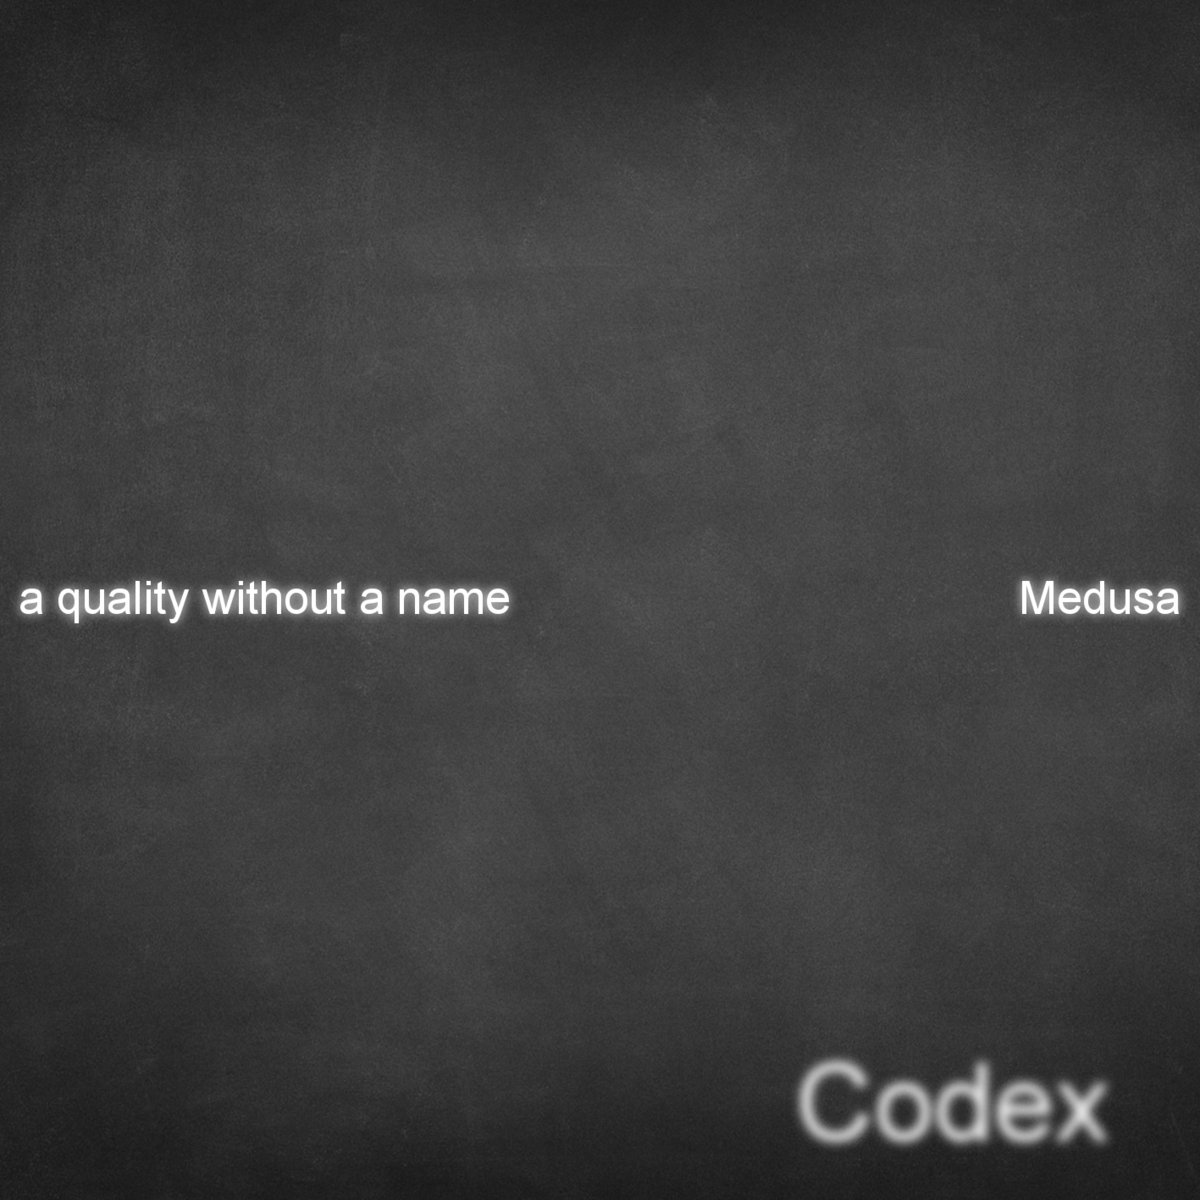 https://dhaturarecords.bandcamp.com/album/medusa